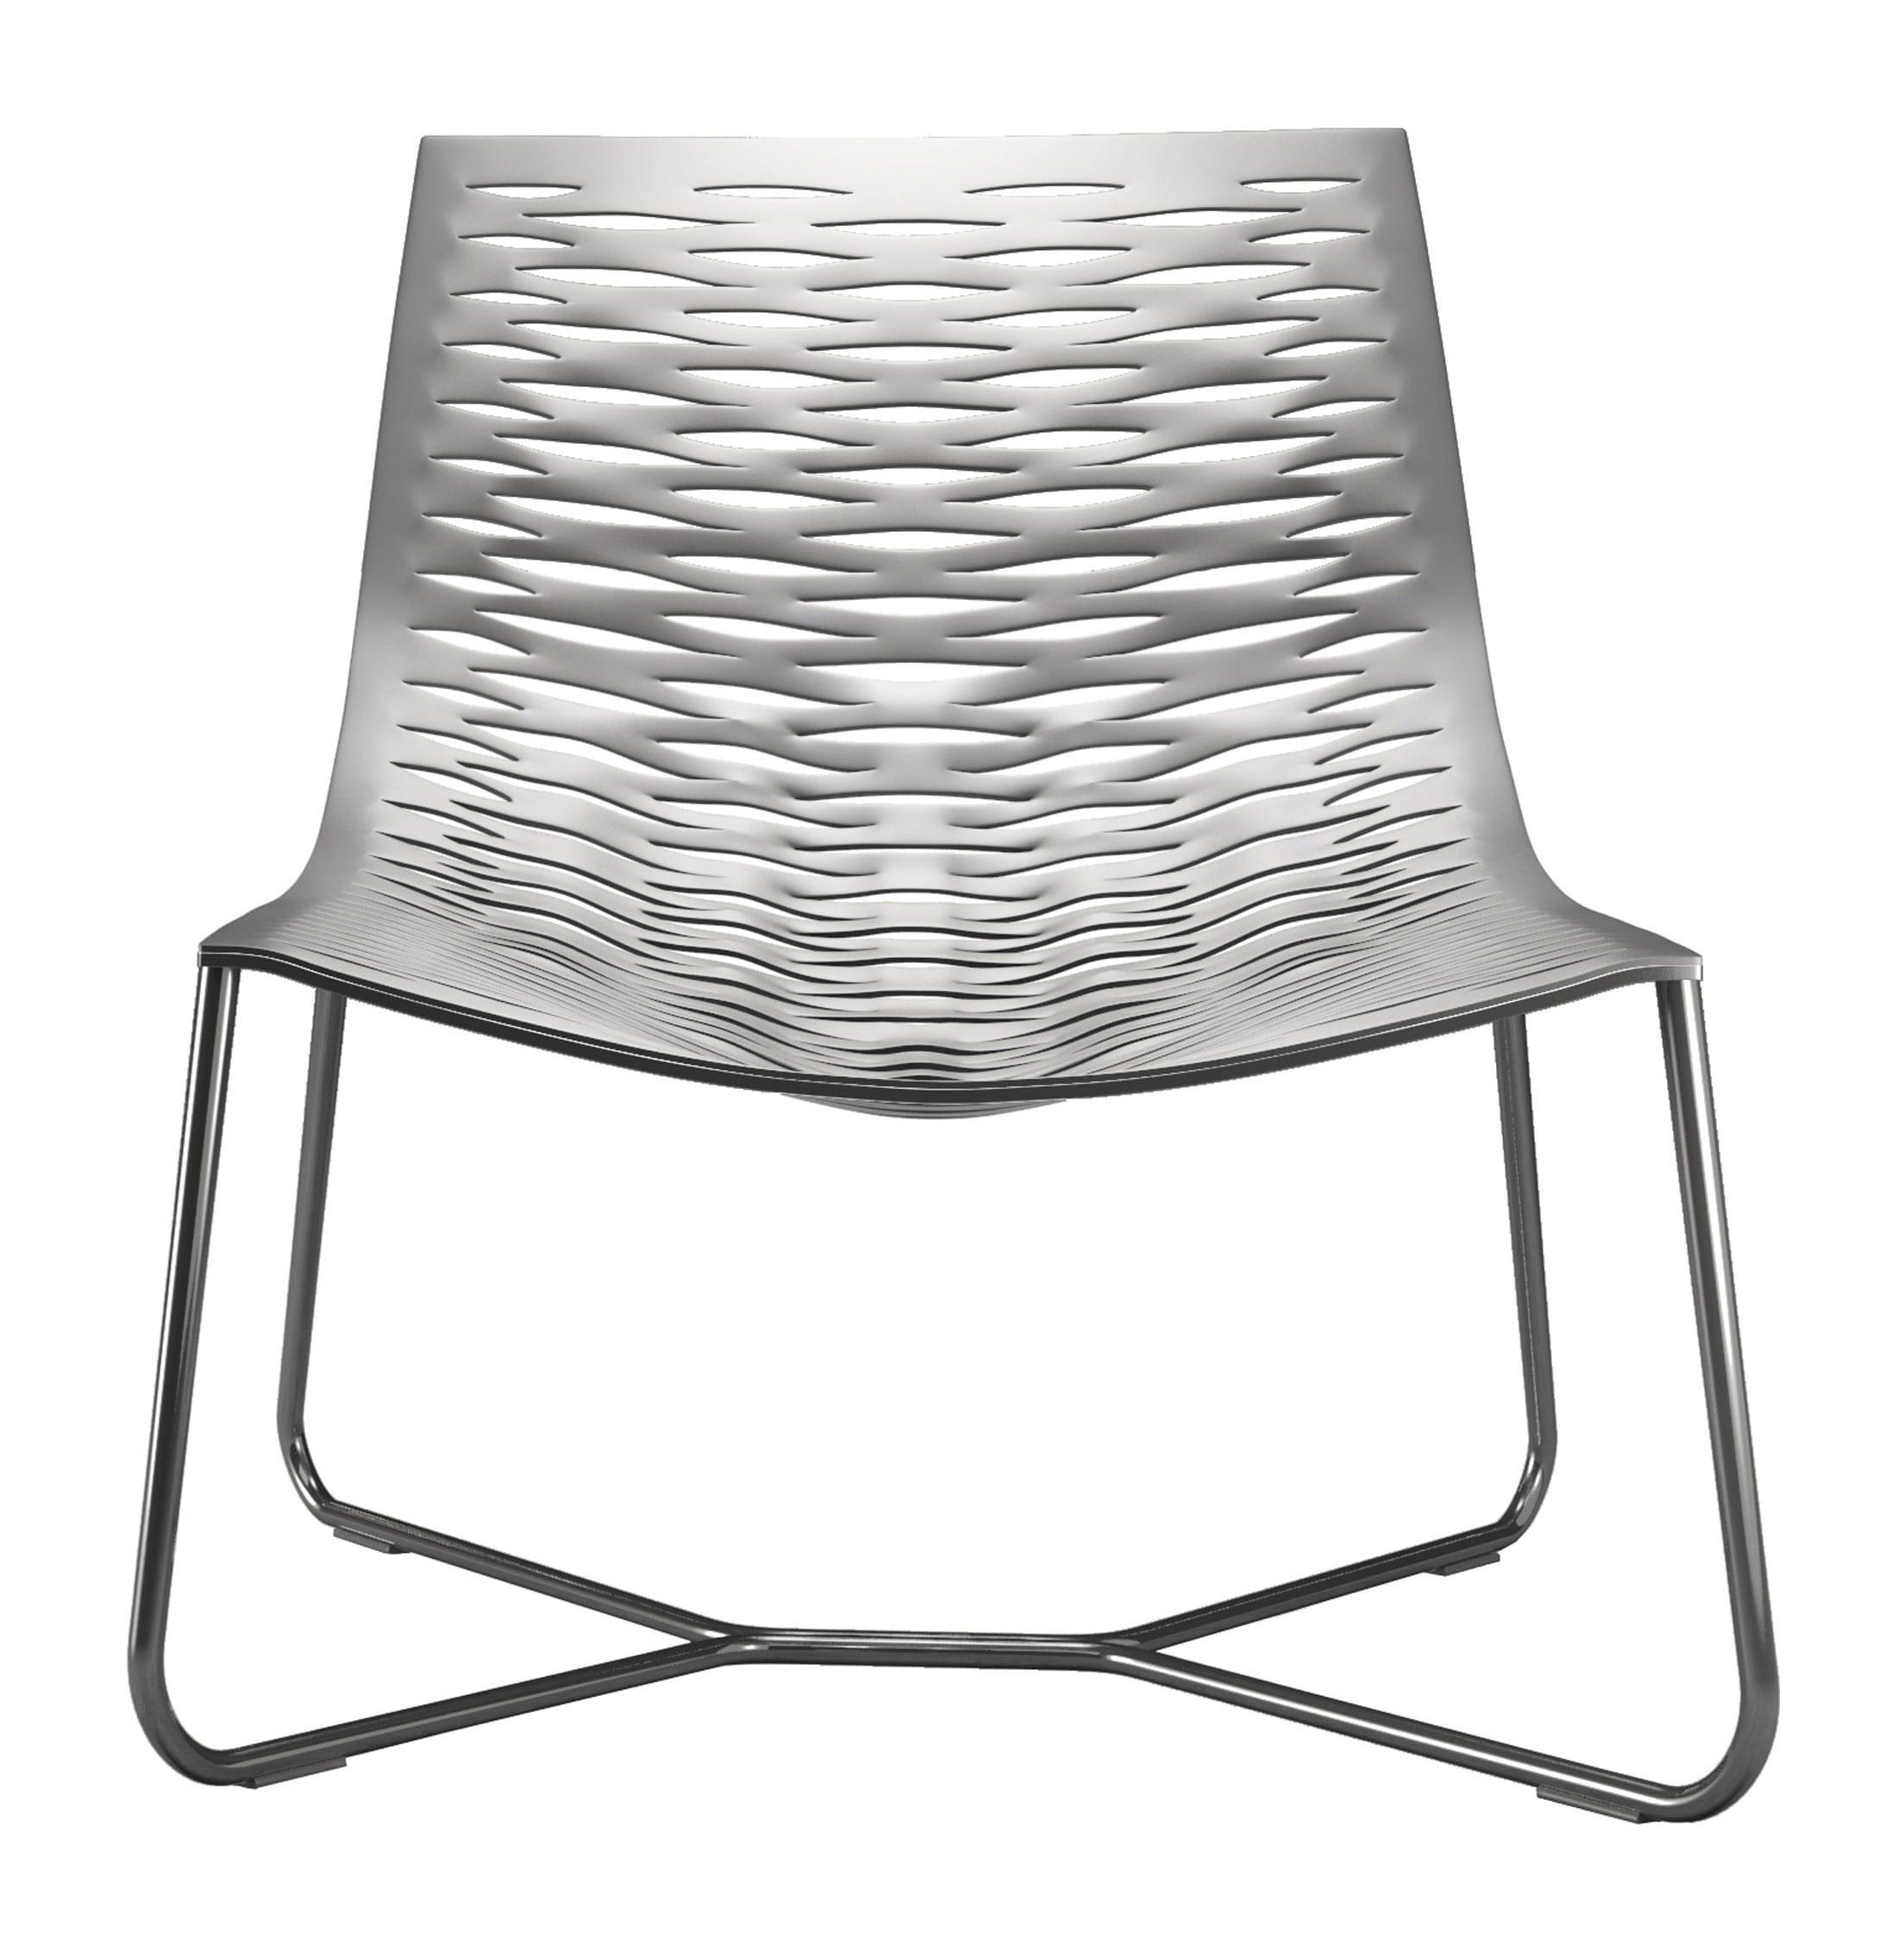 Stupendous York Lounge Chair Bright White By Modloft Machost Co Dining Chair Design Ideas Machostcouk